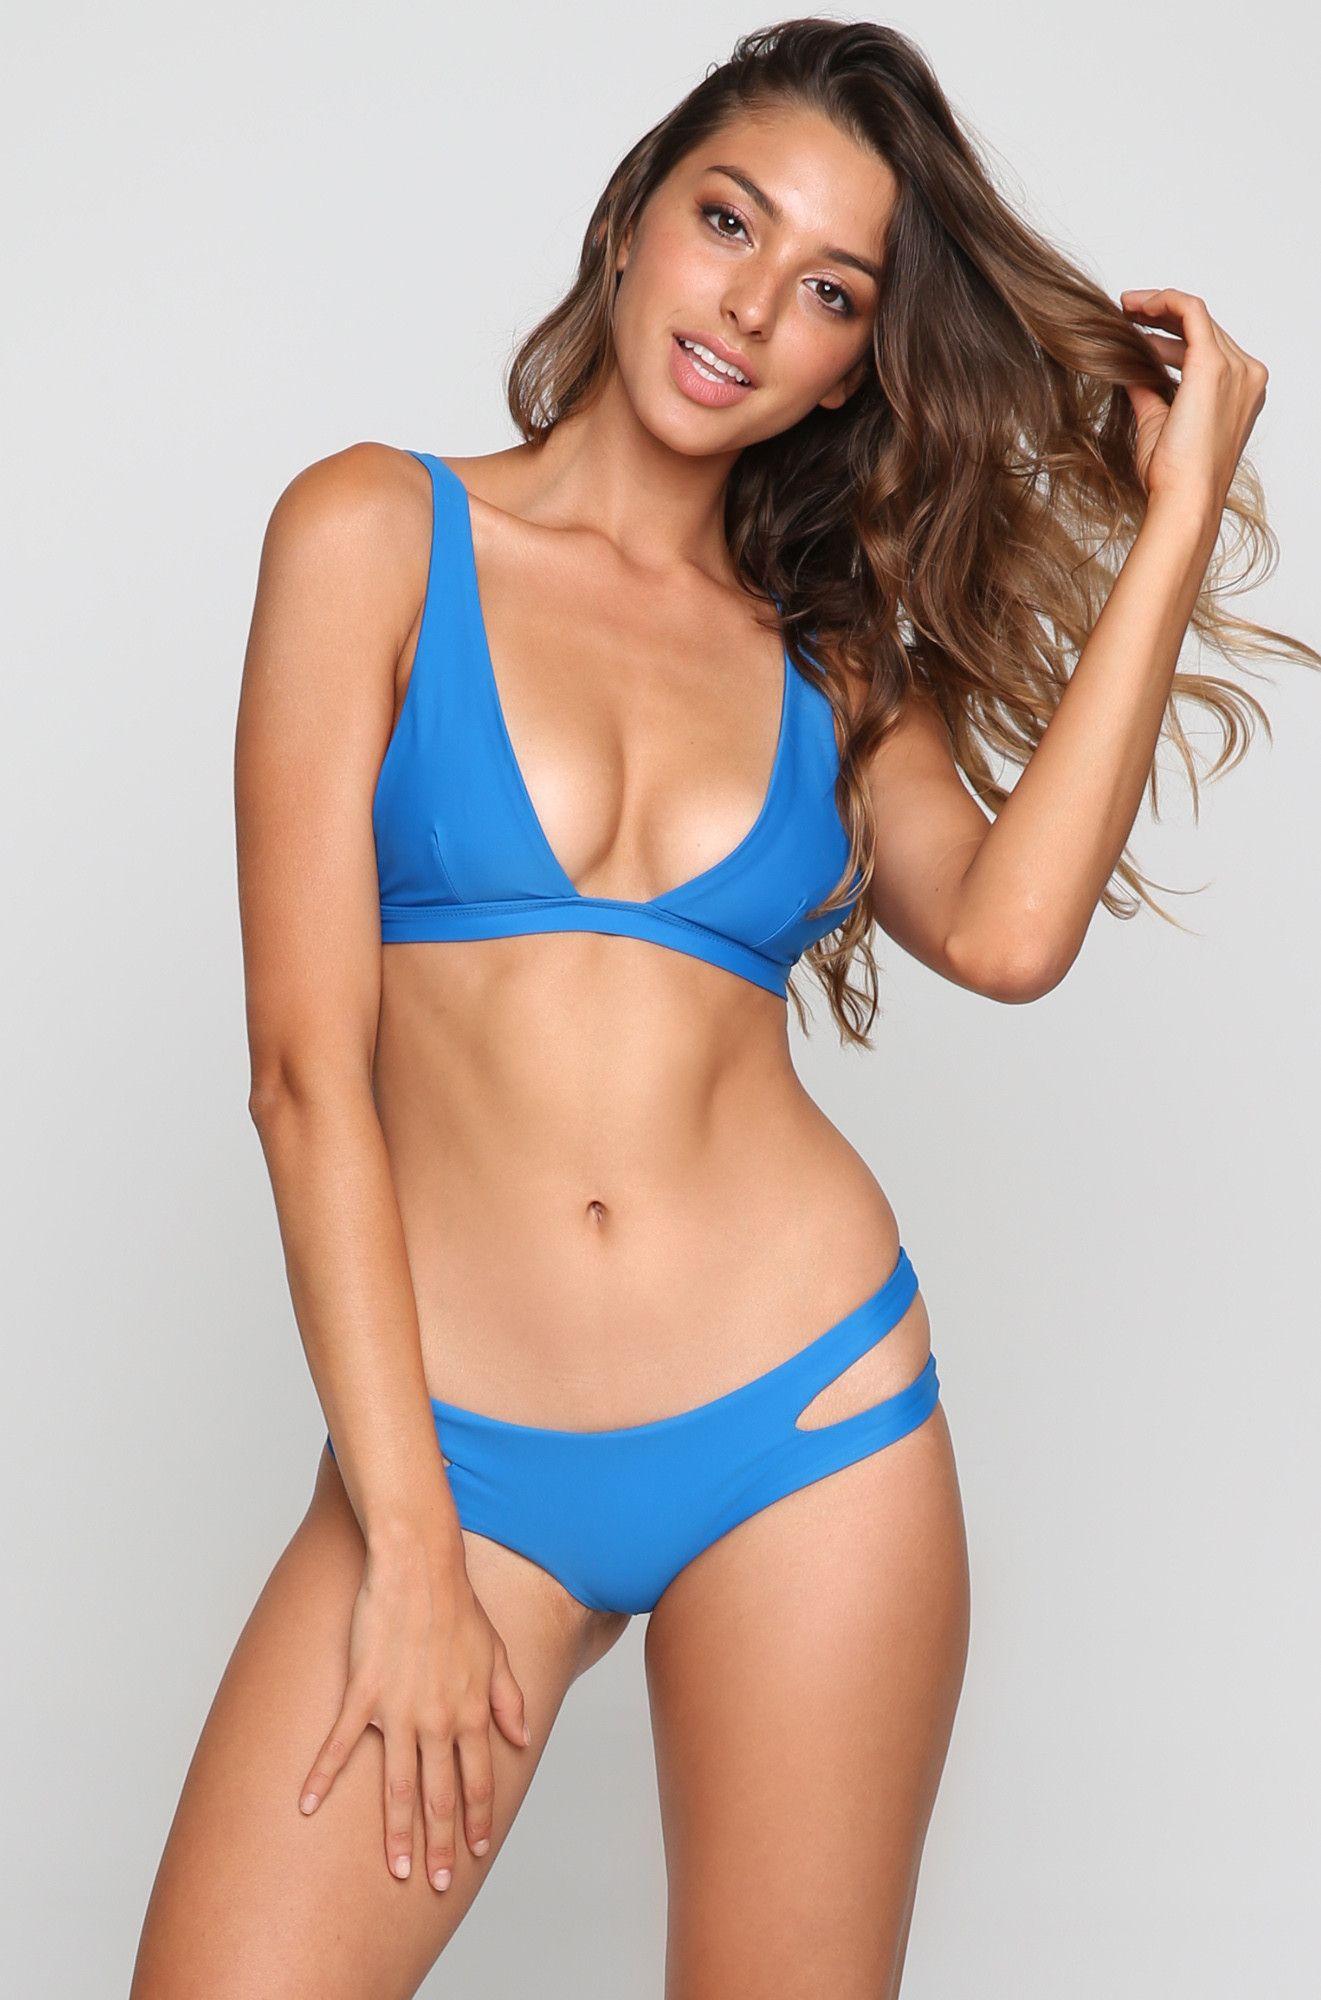 model bikini Bernadette